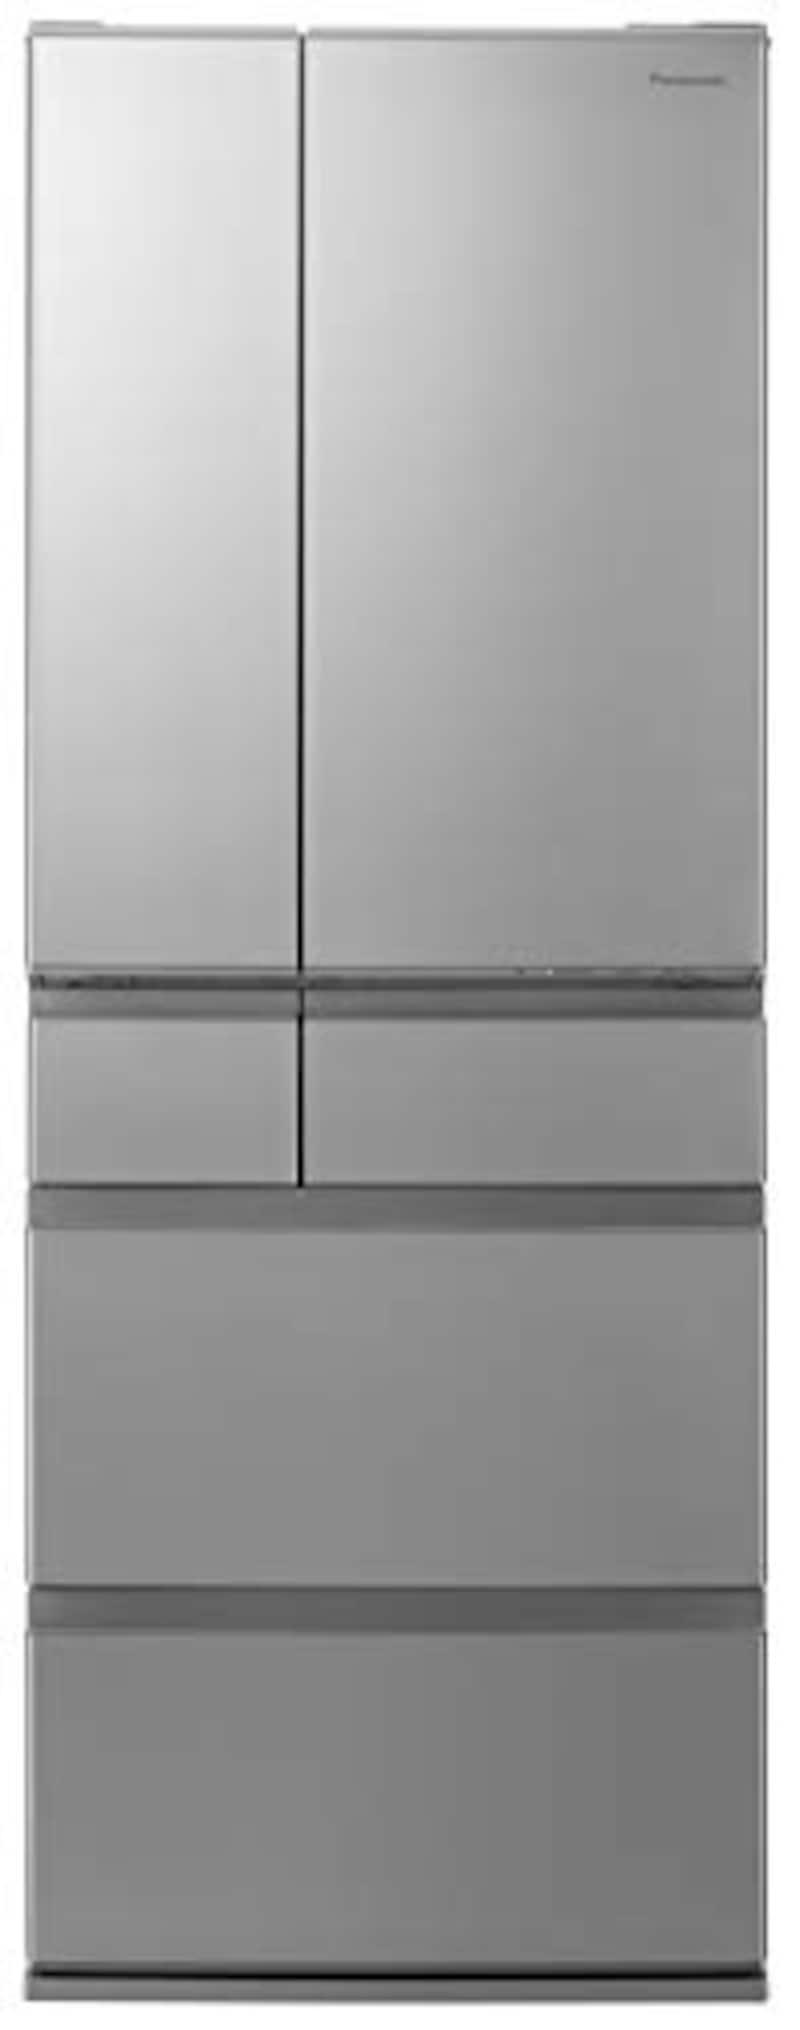 Panasonic(パナソニック),冷蔵庫,NR-F516MEX